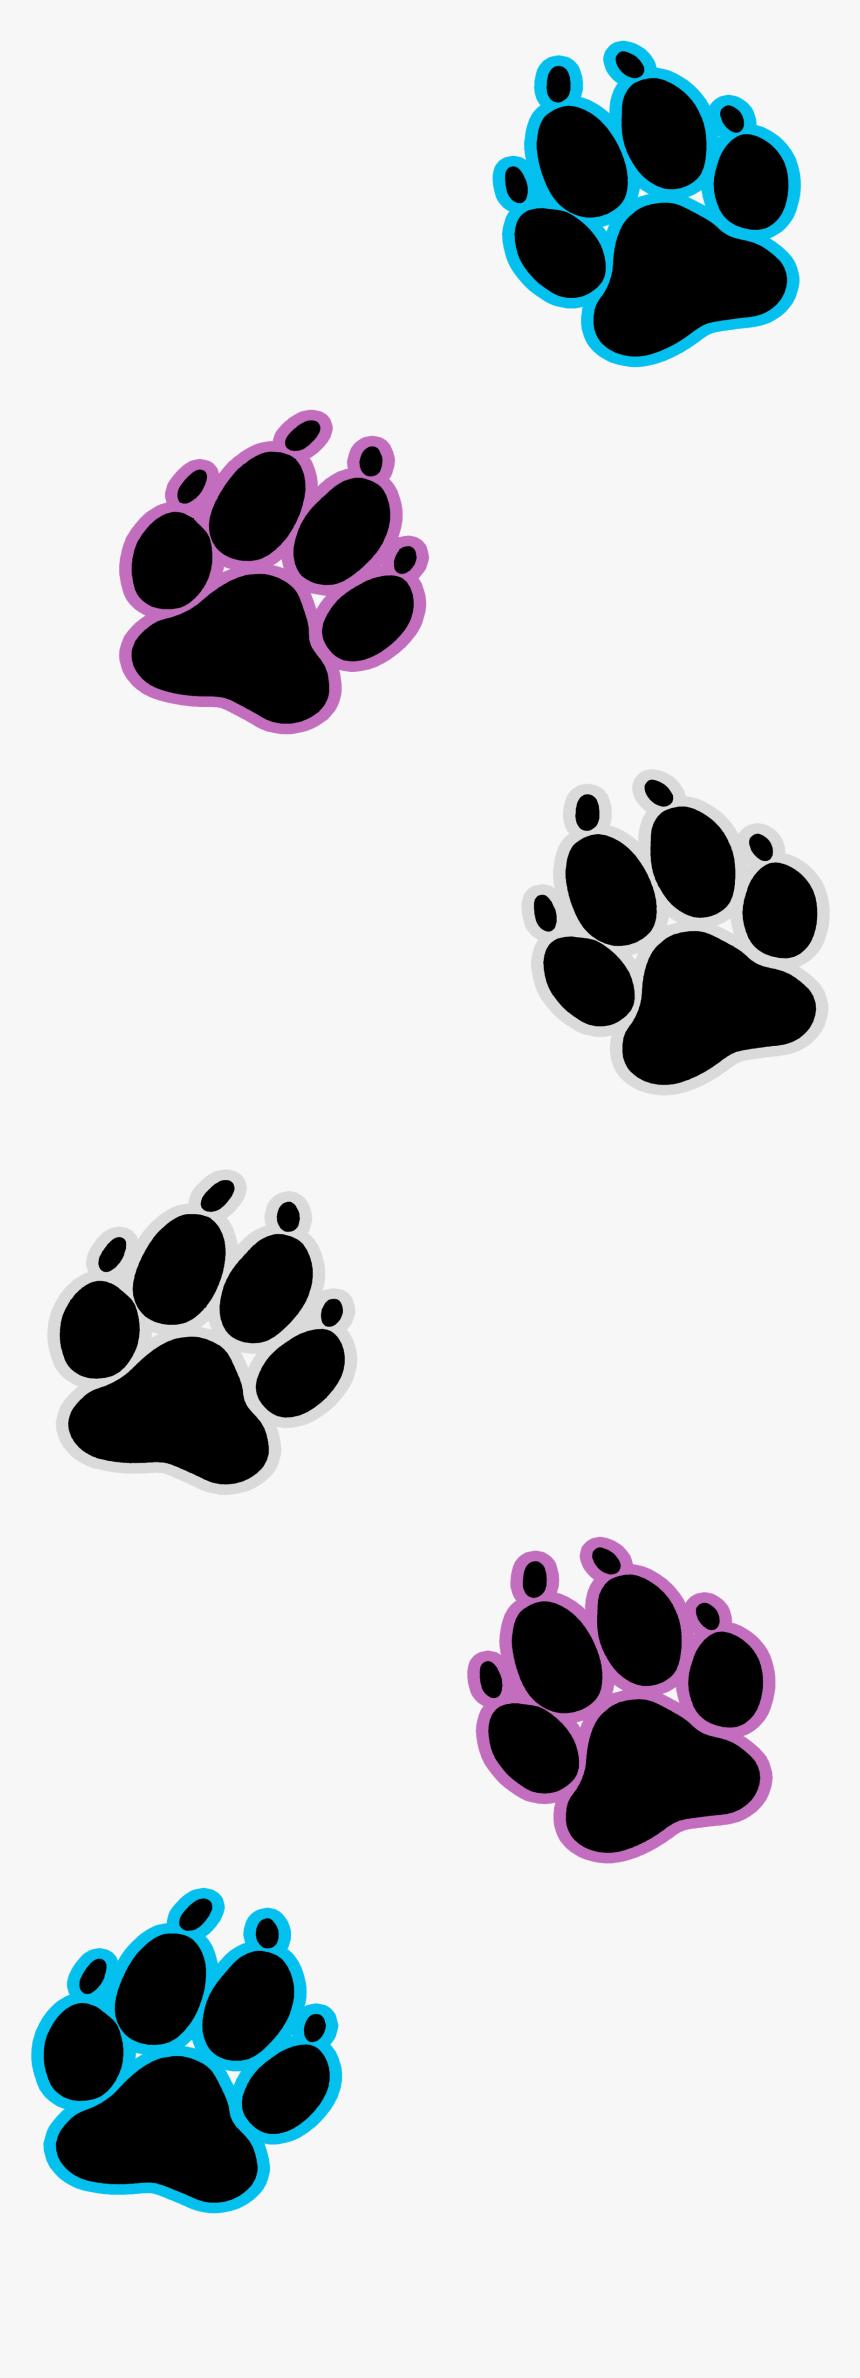 Dog Paw Prints Png Transparent Background Heart Paw Print Png Download Kindpng Download transparent paw print png for free on pngkey.com. dog paw prints png transparent